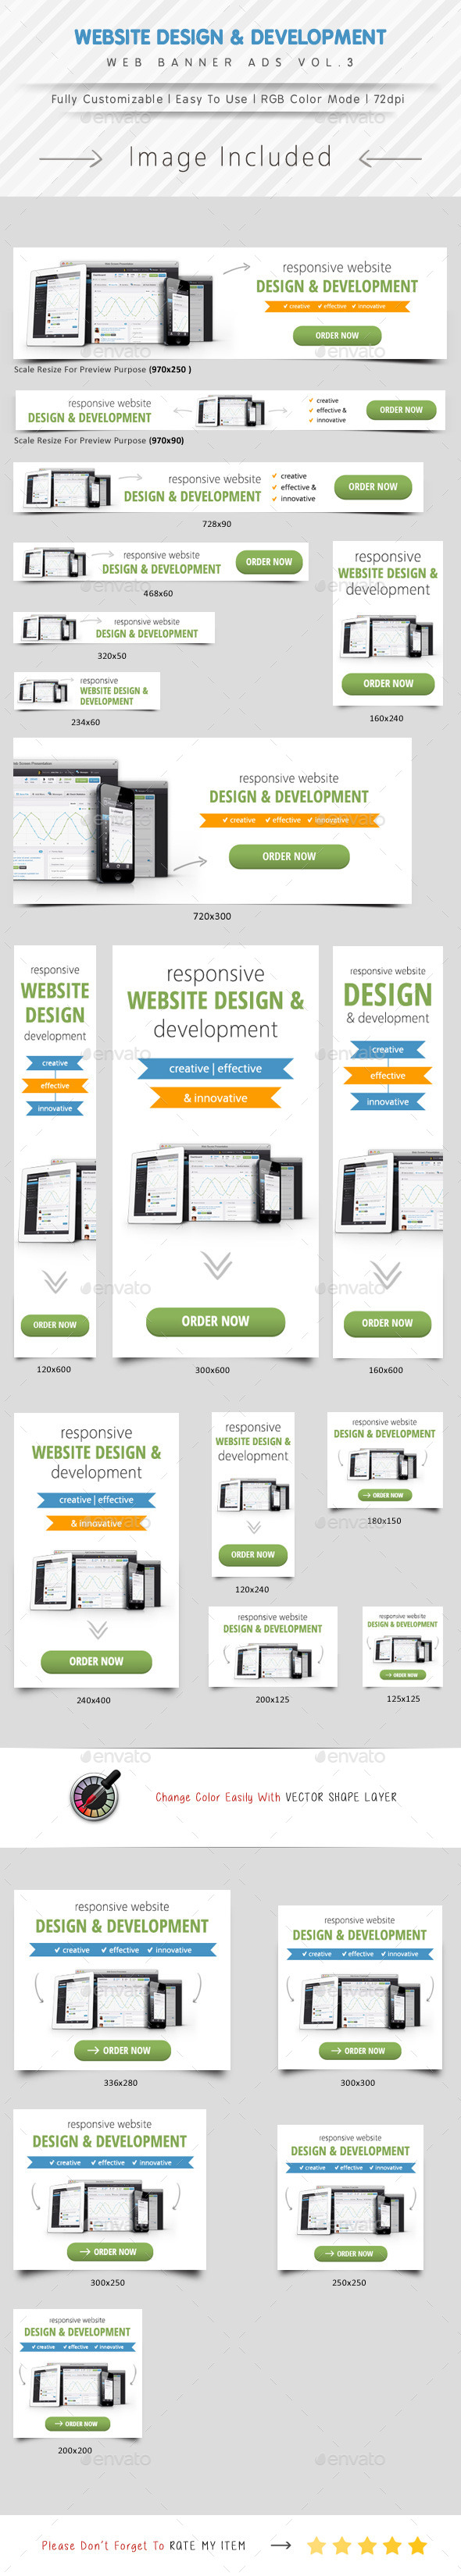 Website Design & Development Banner Ads Vol.3 - Banners & Ads Web Elements